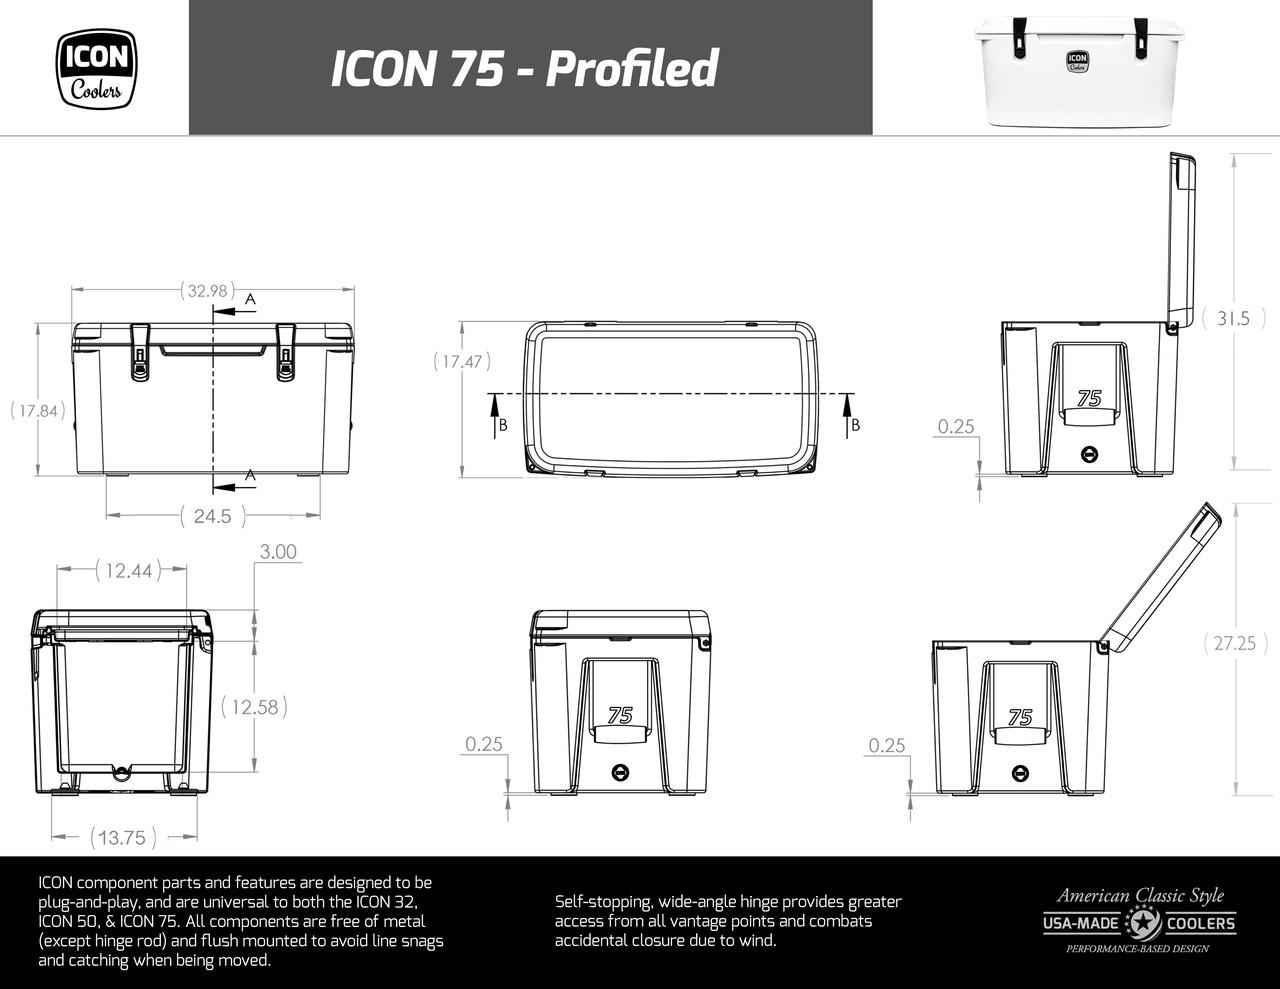 ICON 75 Profiled